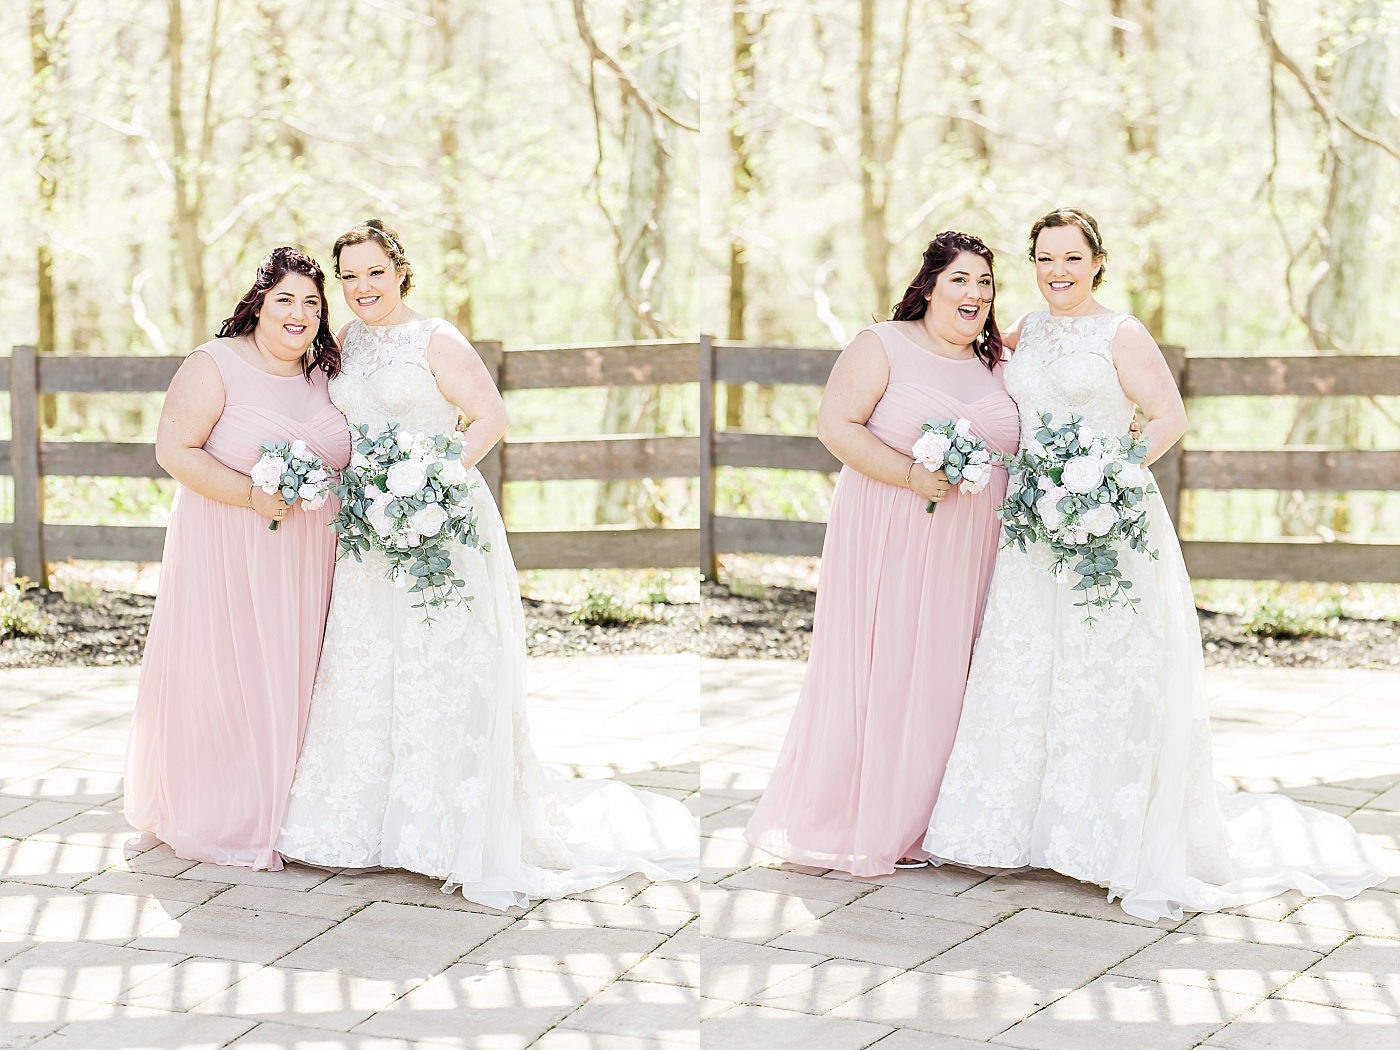 crawfordsville indiana stone creek lodge wedding rustic elegant friends theme_0137.jpg